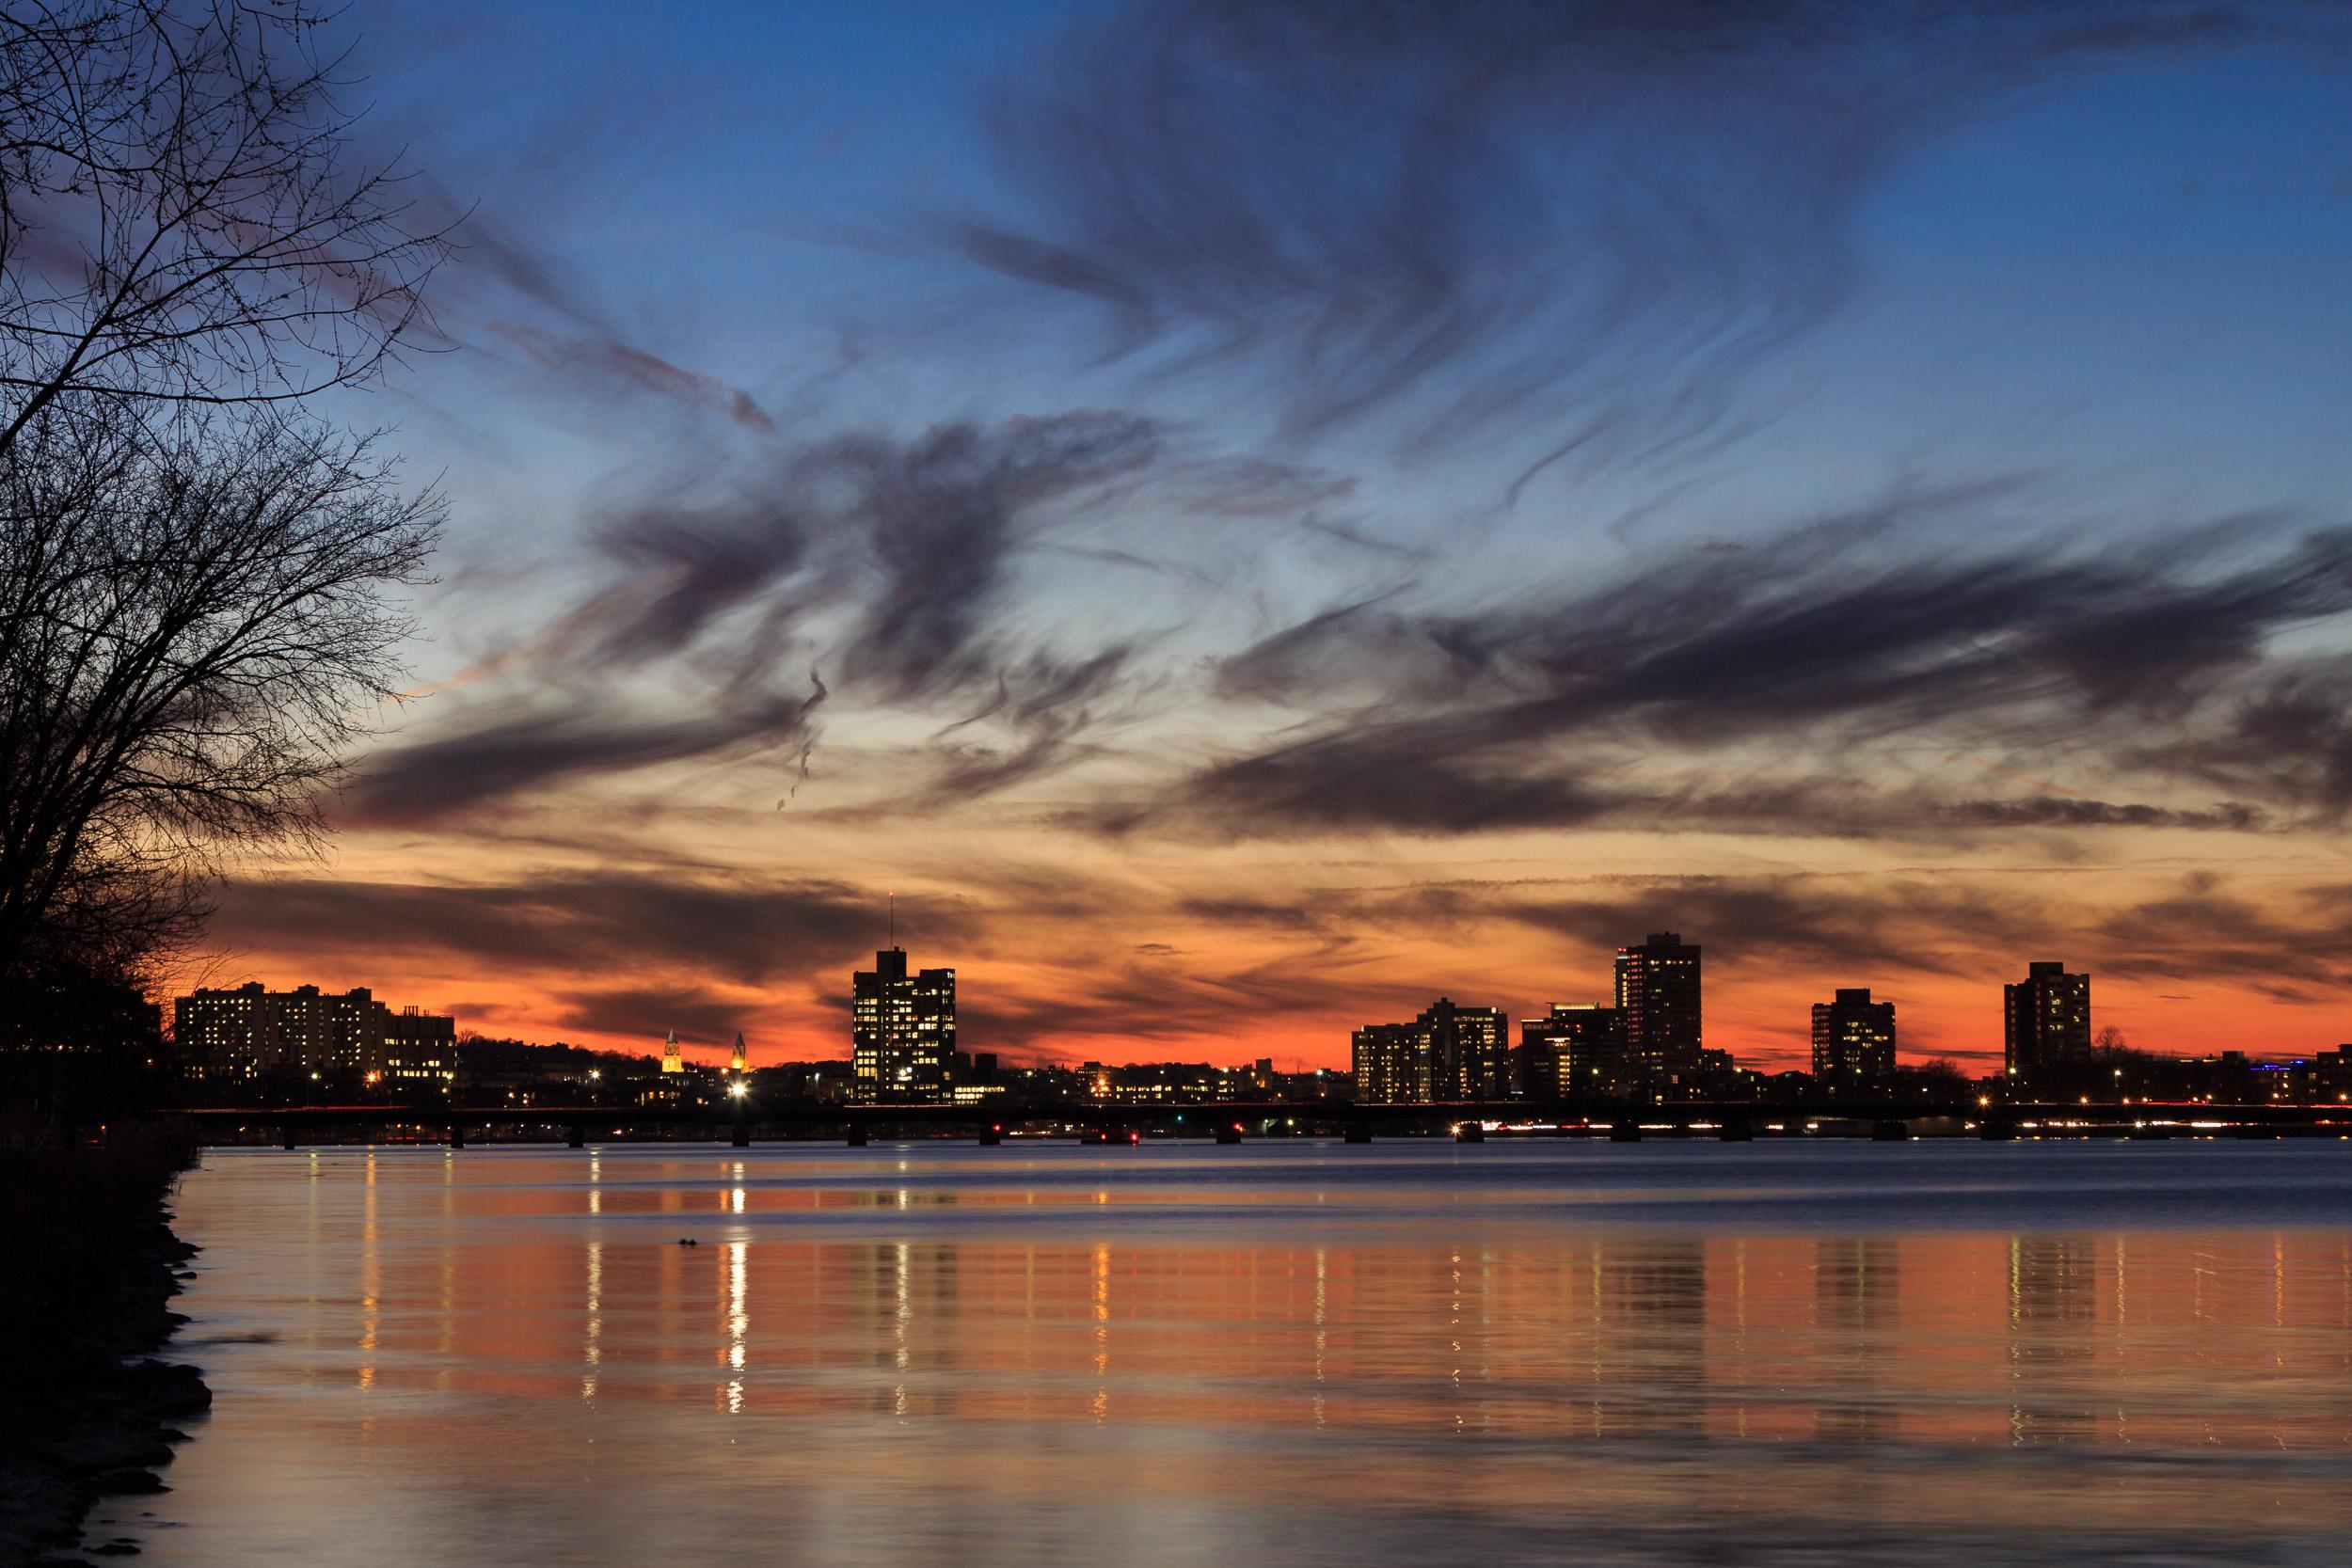 Cambridge_sunset_Miami_Fort_Lauderdale_commercial_photographer_Franklin_Castillo.jpg